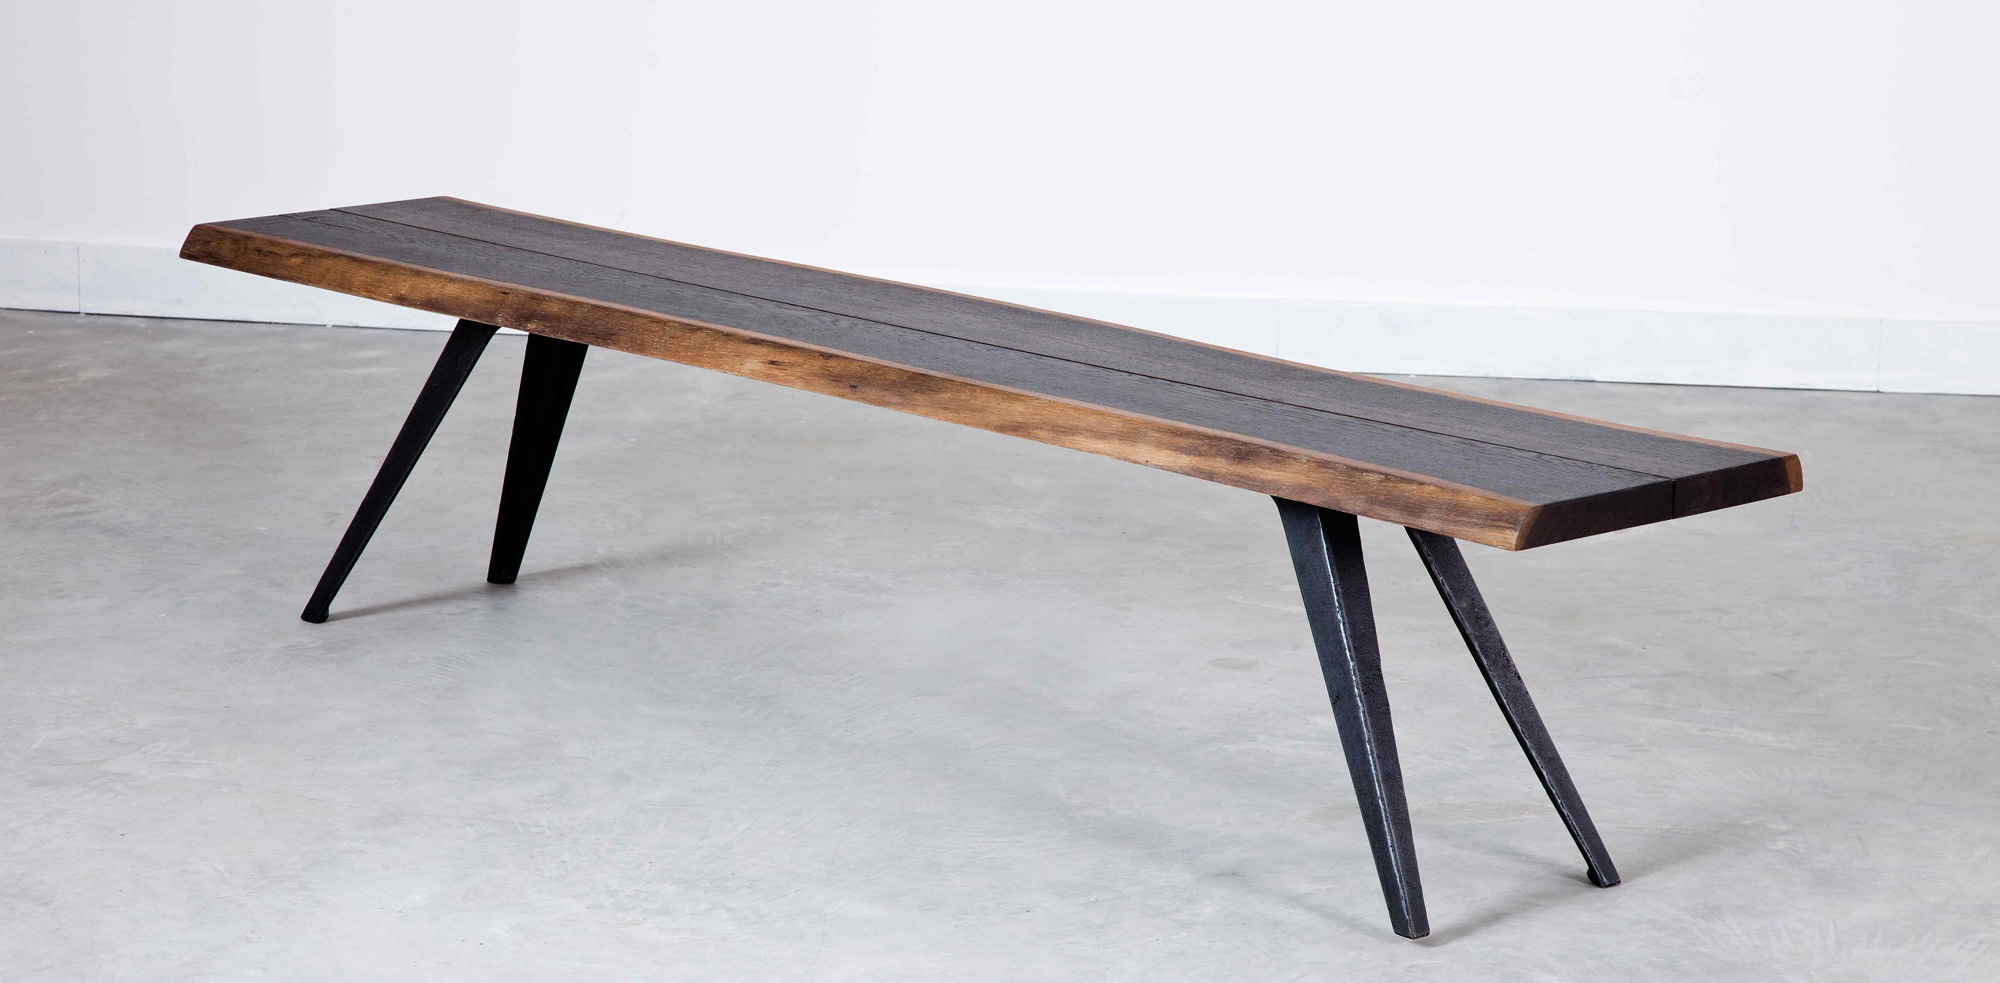 Vega bench hip furniture for Hip furniture